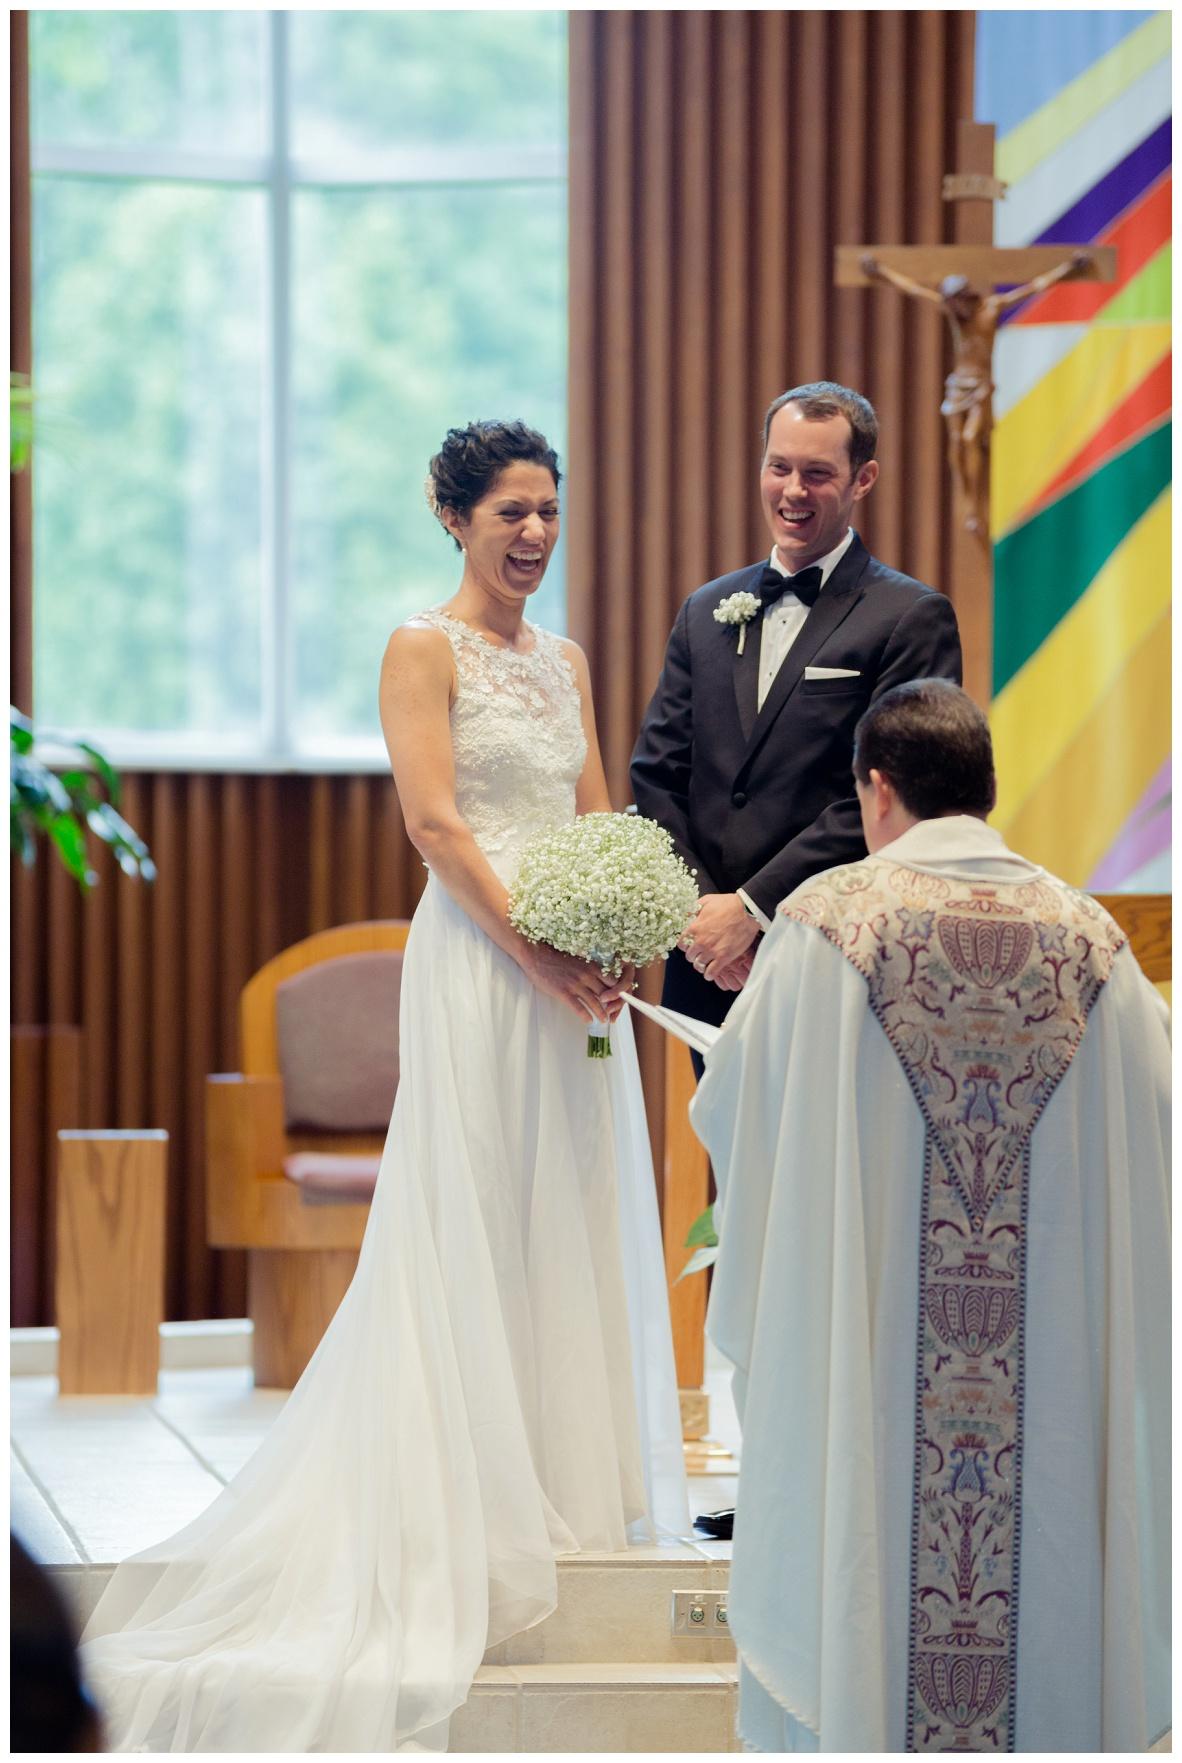 The Wedding of Danielle and Matt_0038.jpg